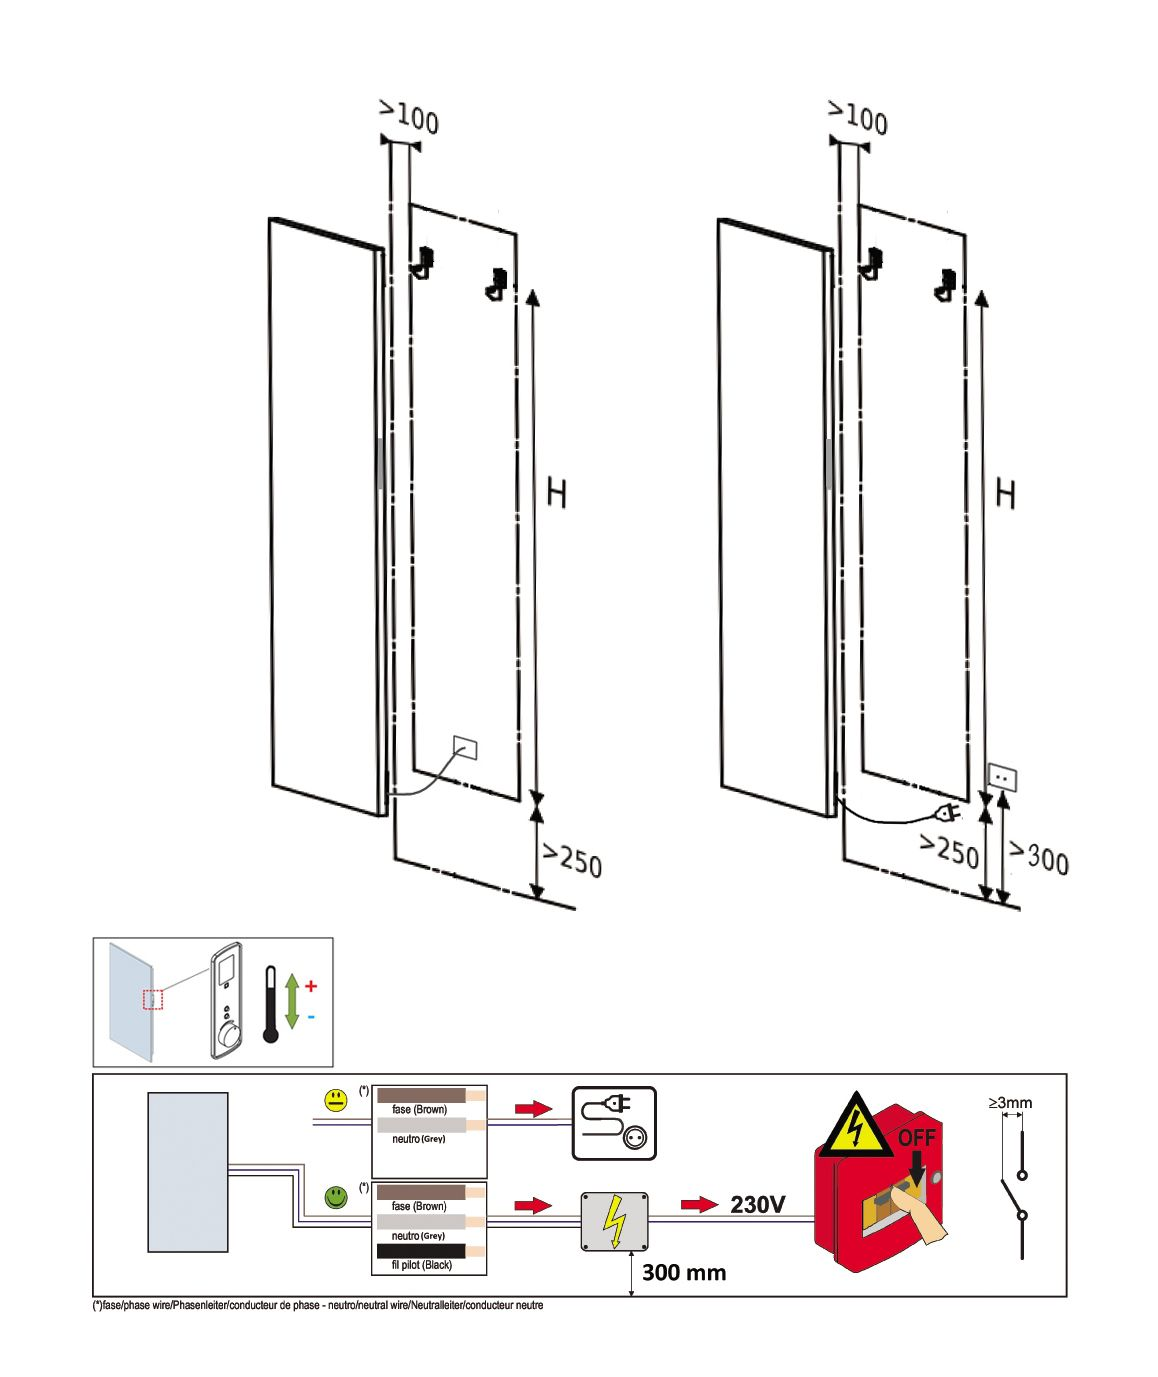 STONE KÜHLER GARTEN - Design-Heizkörper | Online Heizkörper EU